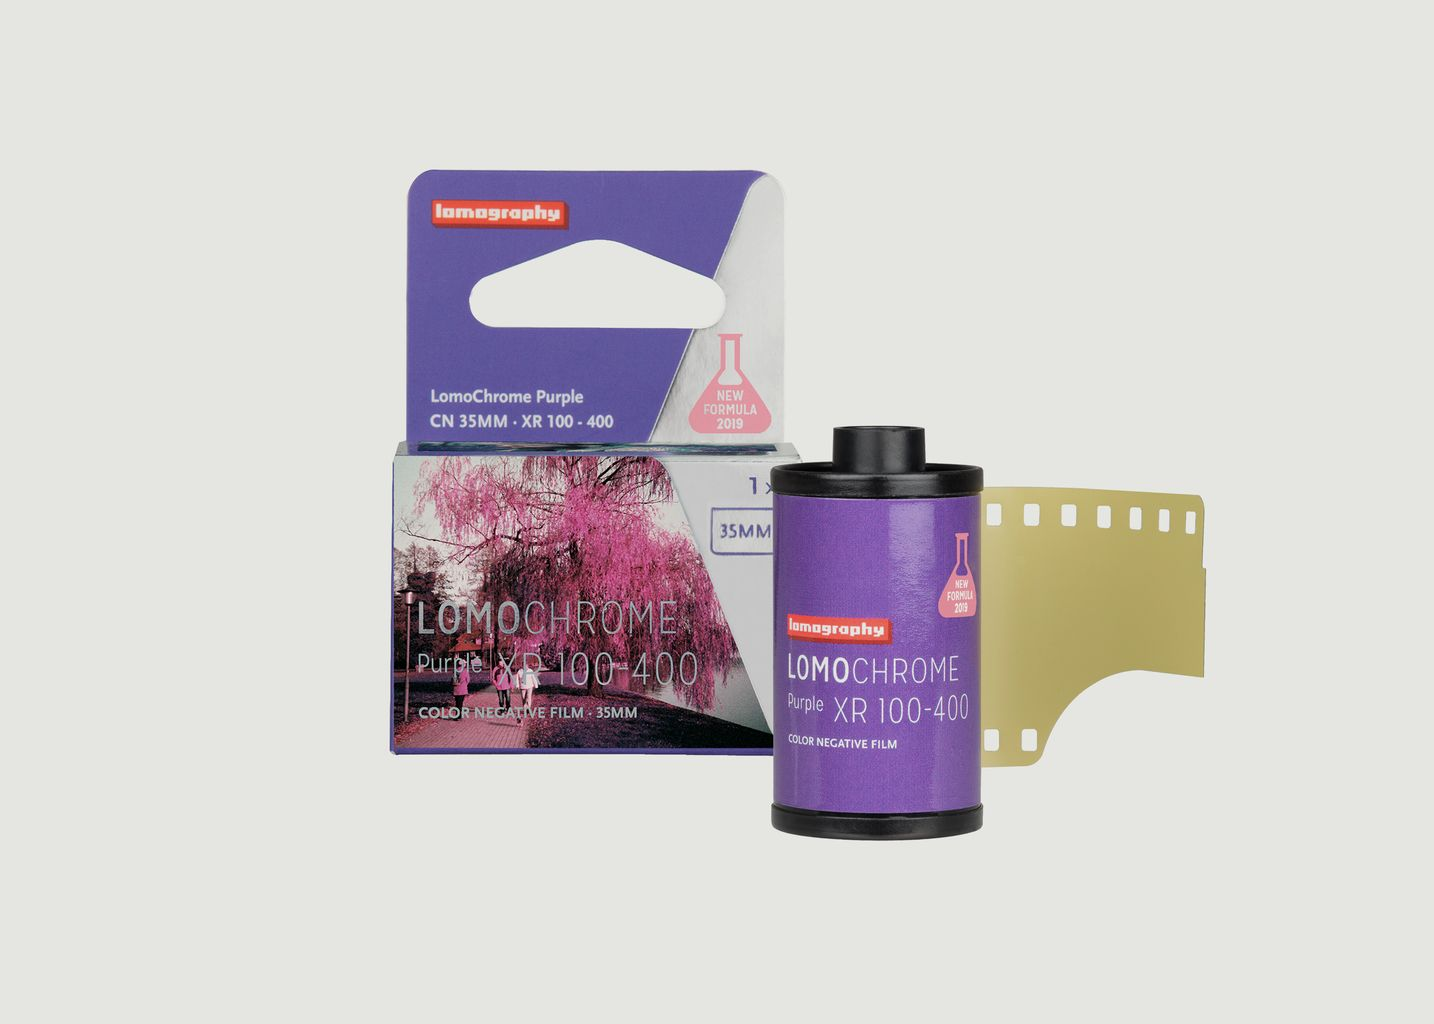 Film LomoChrome Purple 35 mm 2019 - 1 pack - Lomography